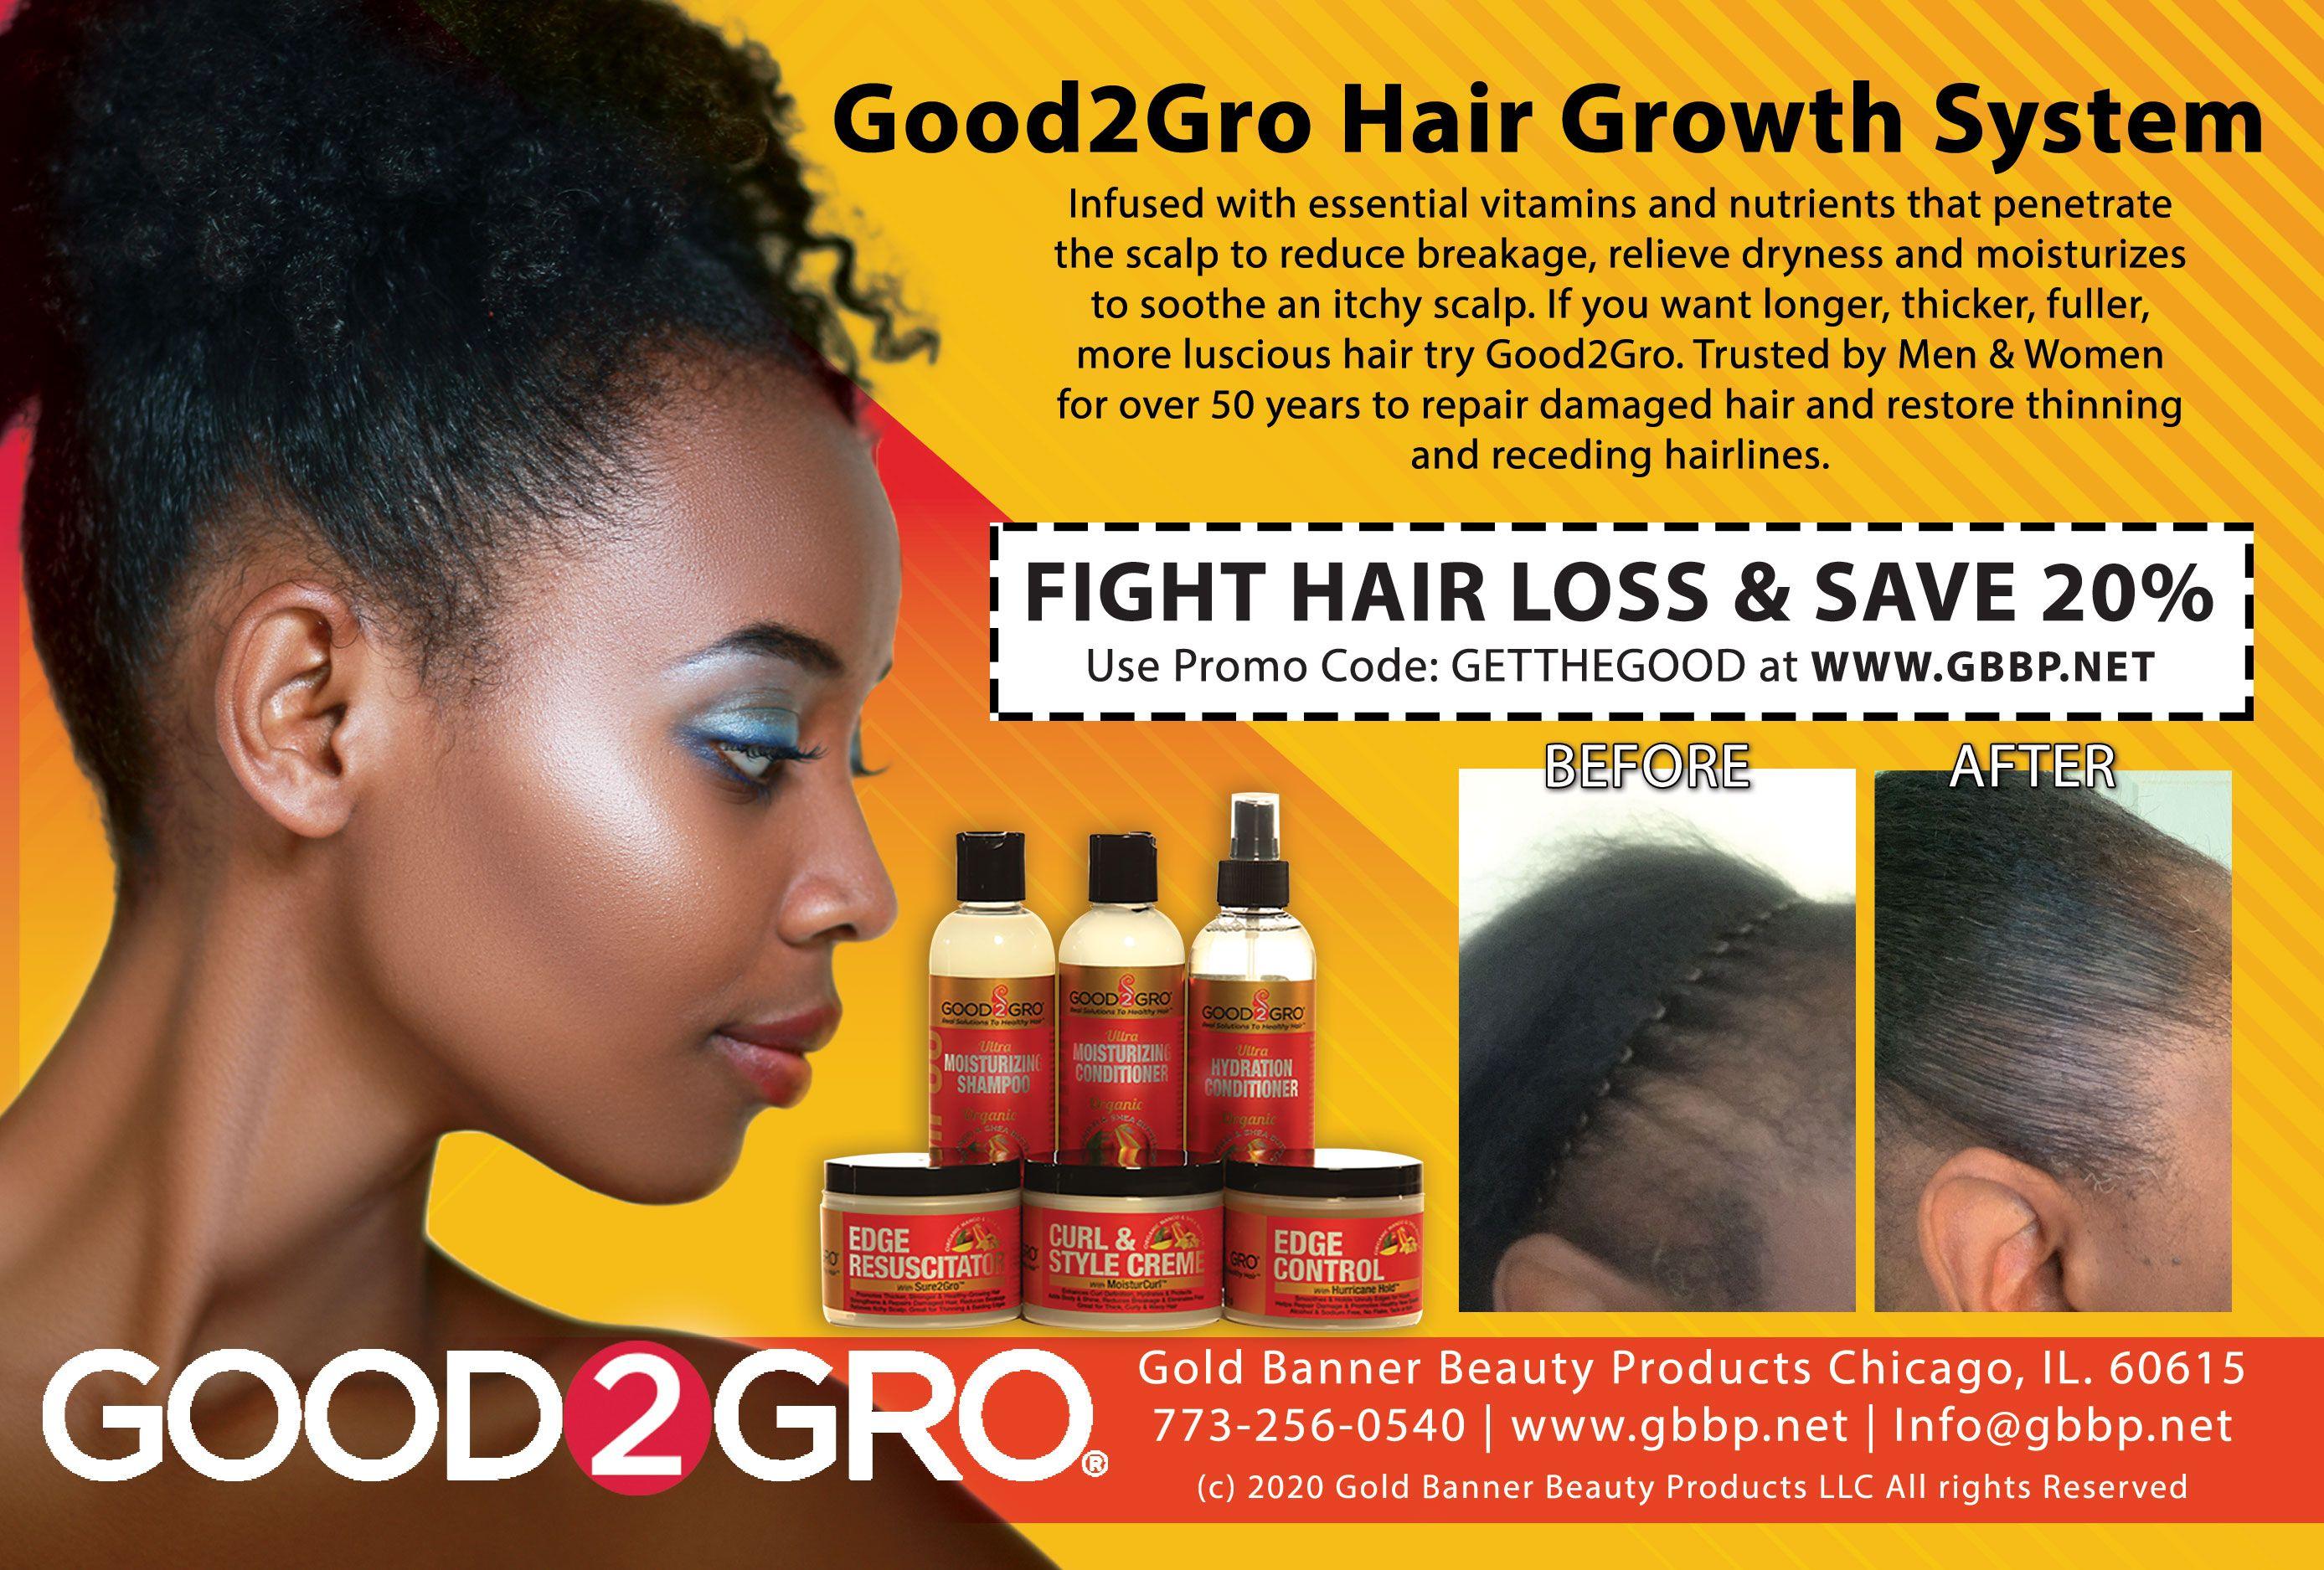 Good2gro Hair Growth System In 2020 Hair Growth System Healthy Hair Growth Damaged Hair Repair